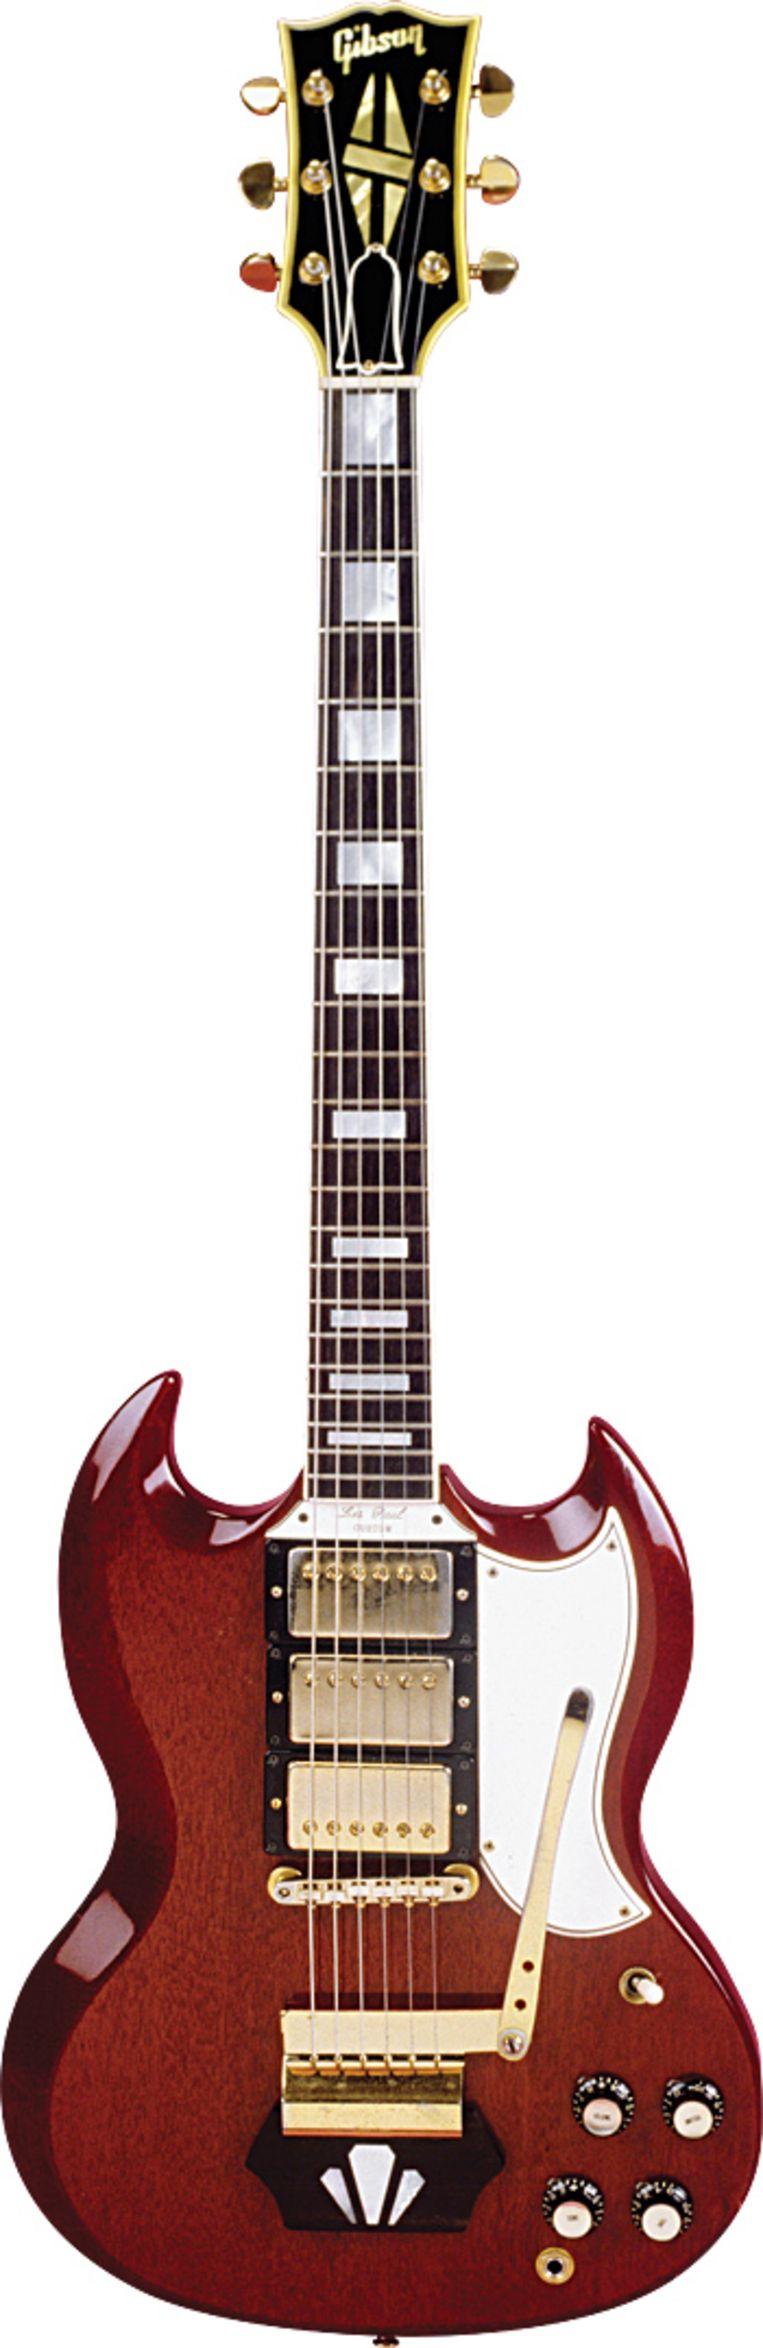 Gibson '62 Les Paul Beeld rv